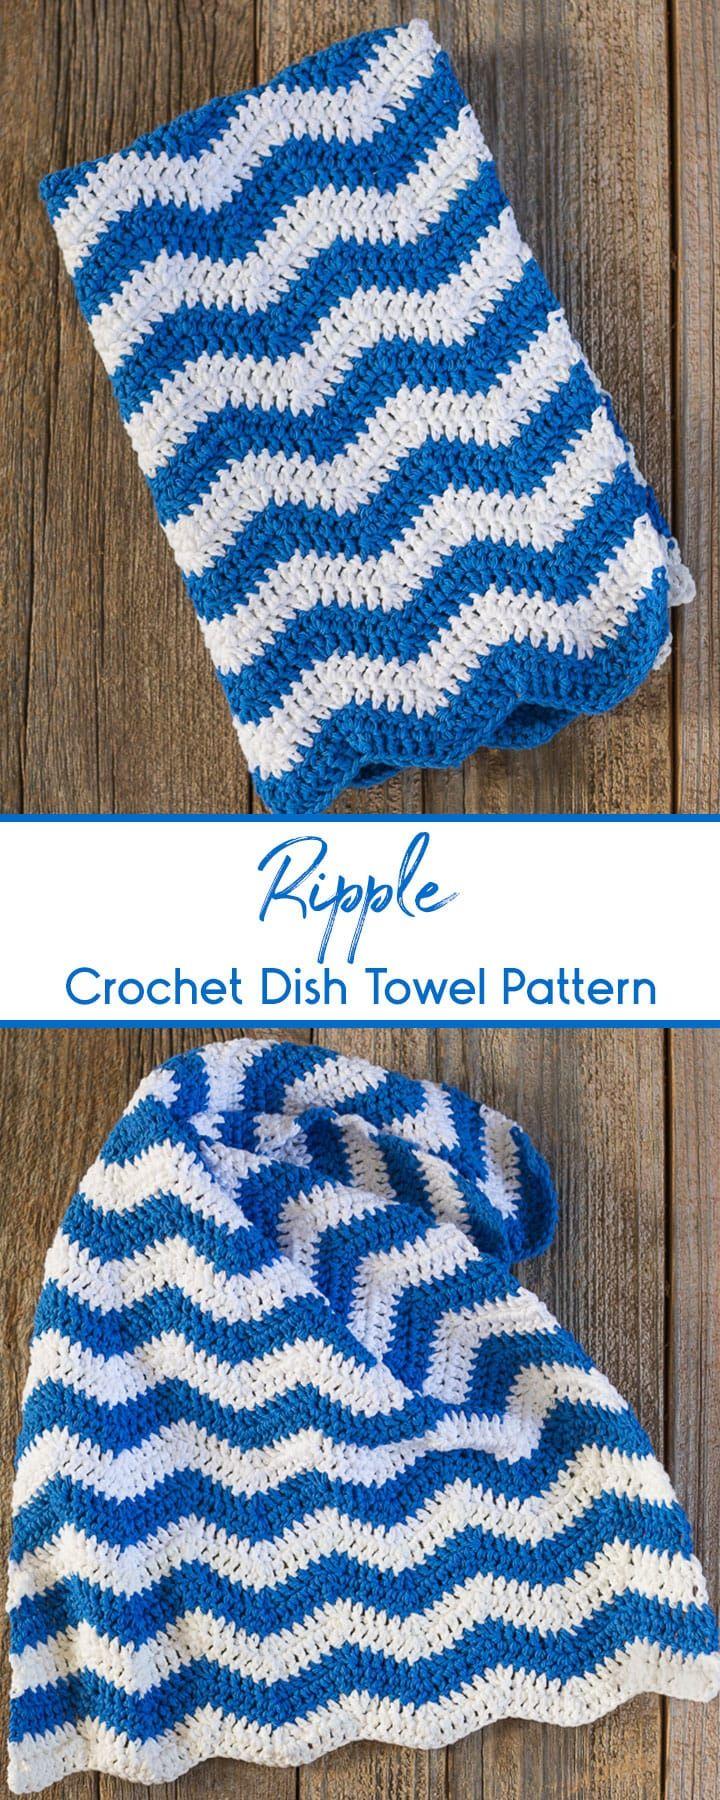 Crochet Dish Towel Pattern Interesting Decoration